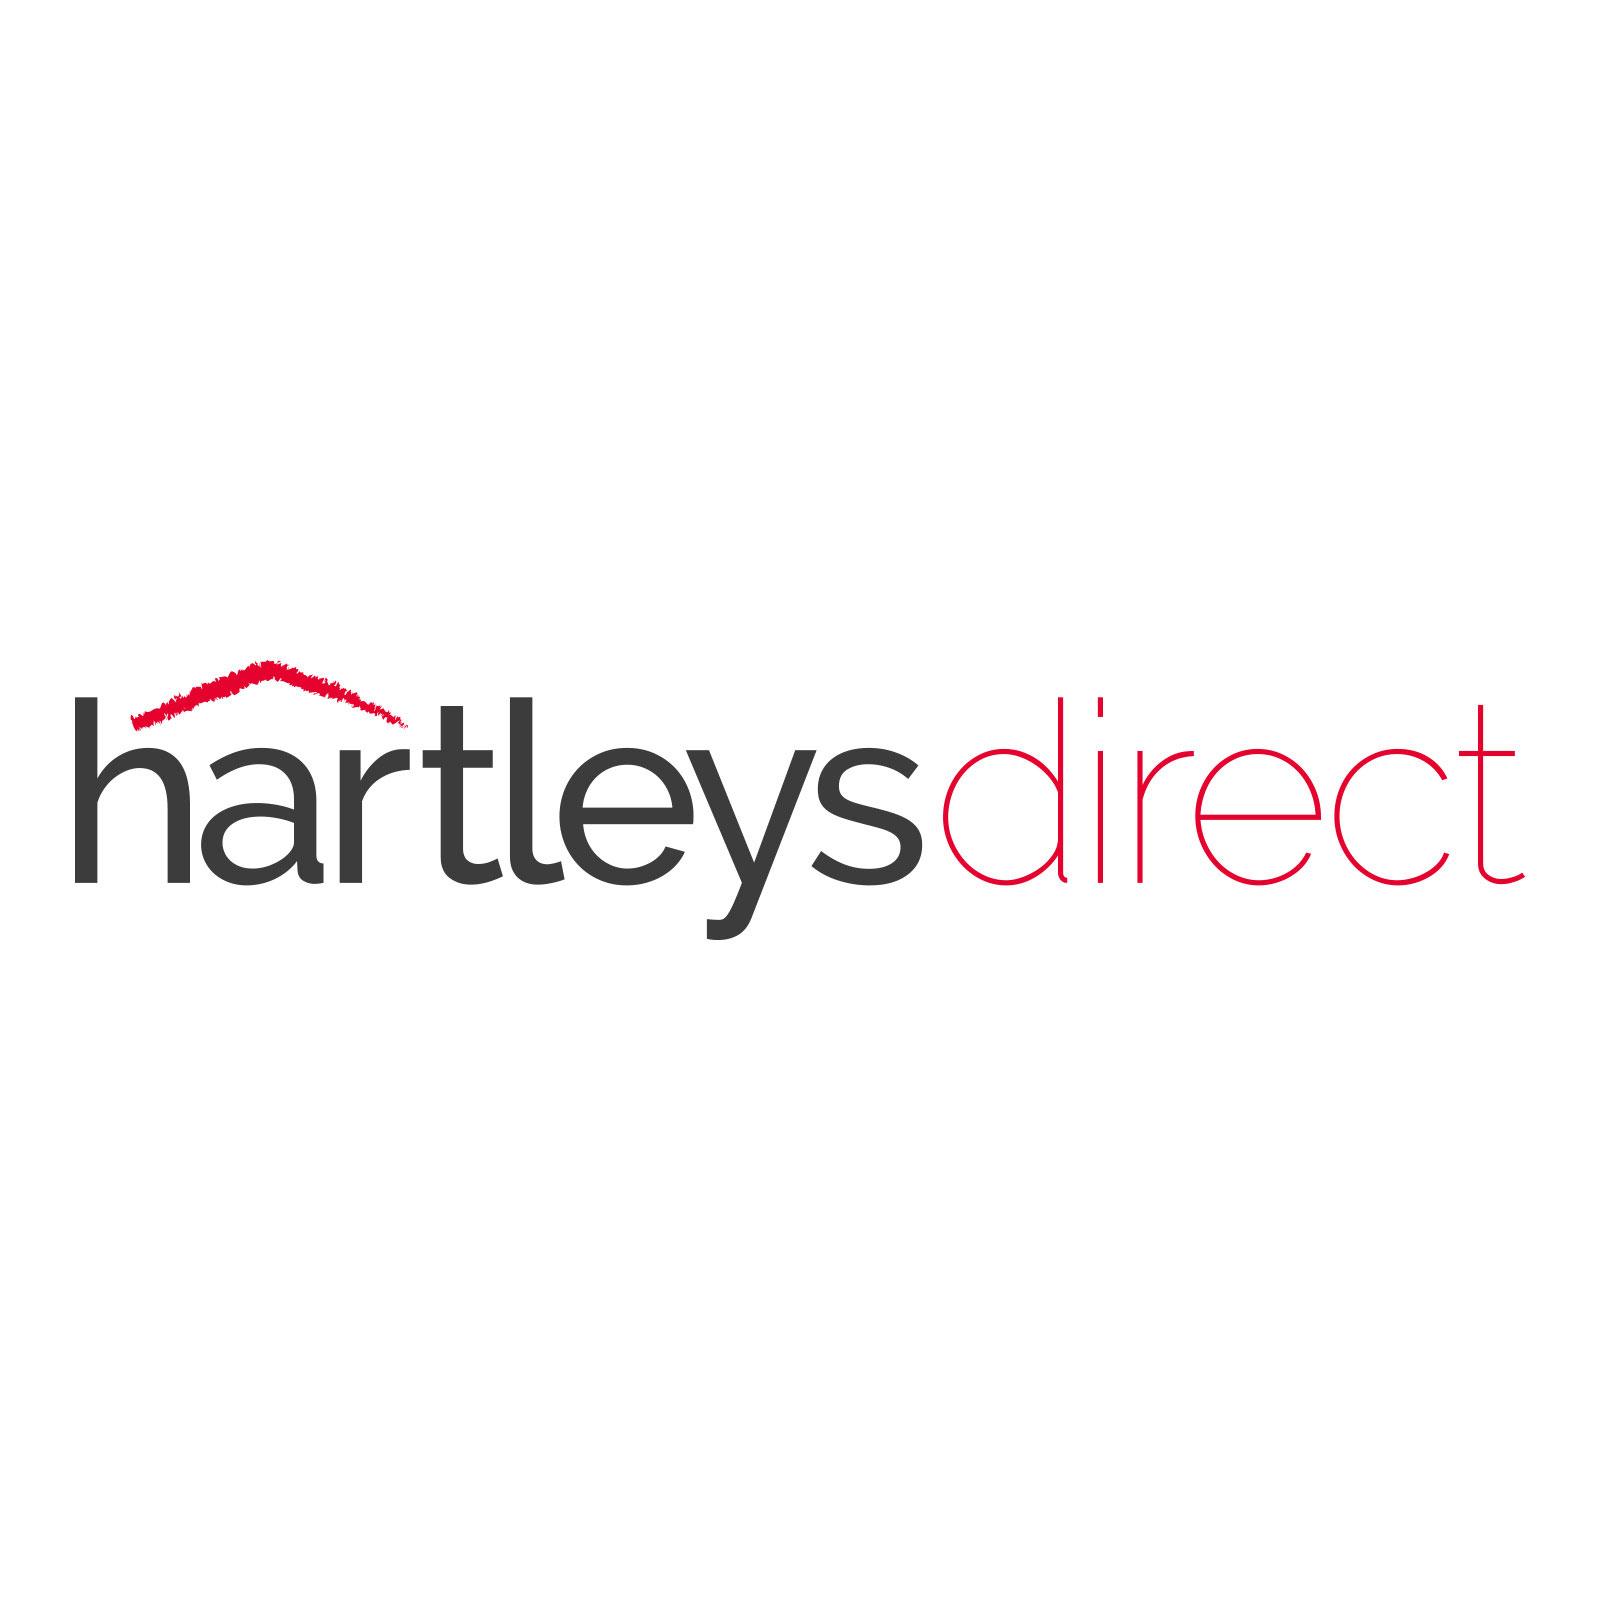 Hartleys-Multi-Purpose-3-Tier-Trolley-on-White-Background.jpg